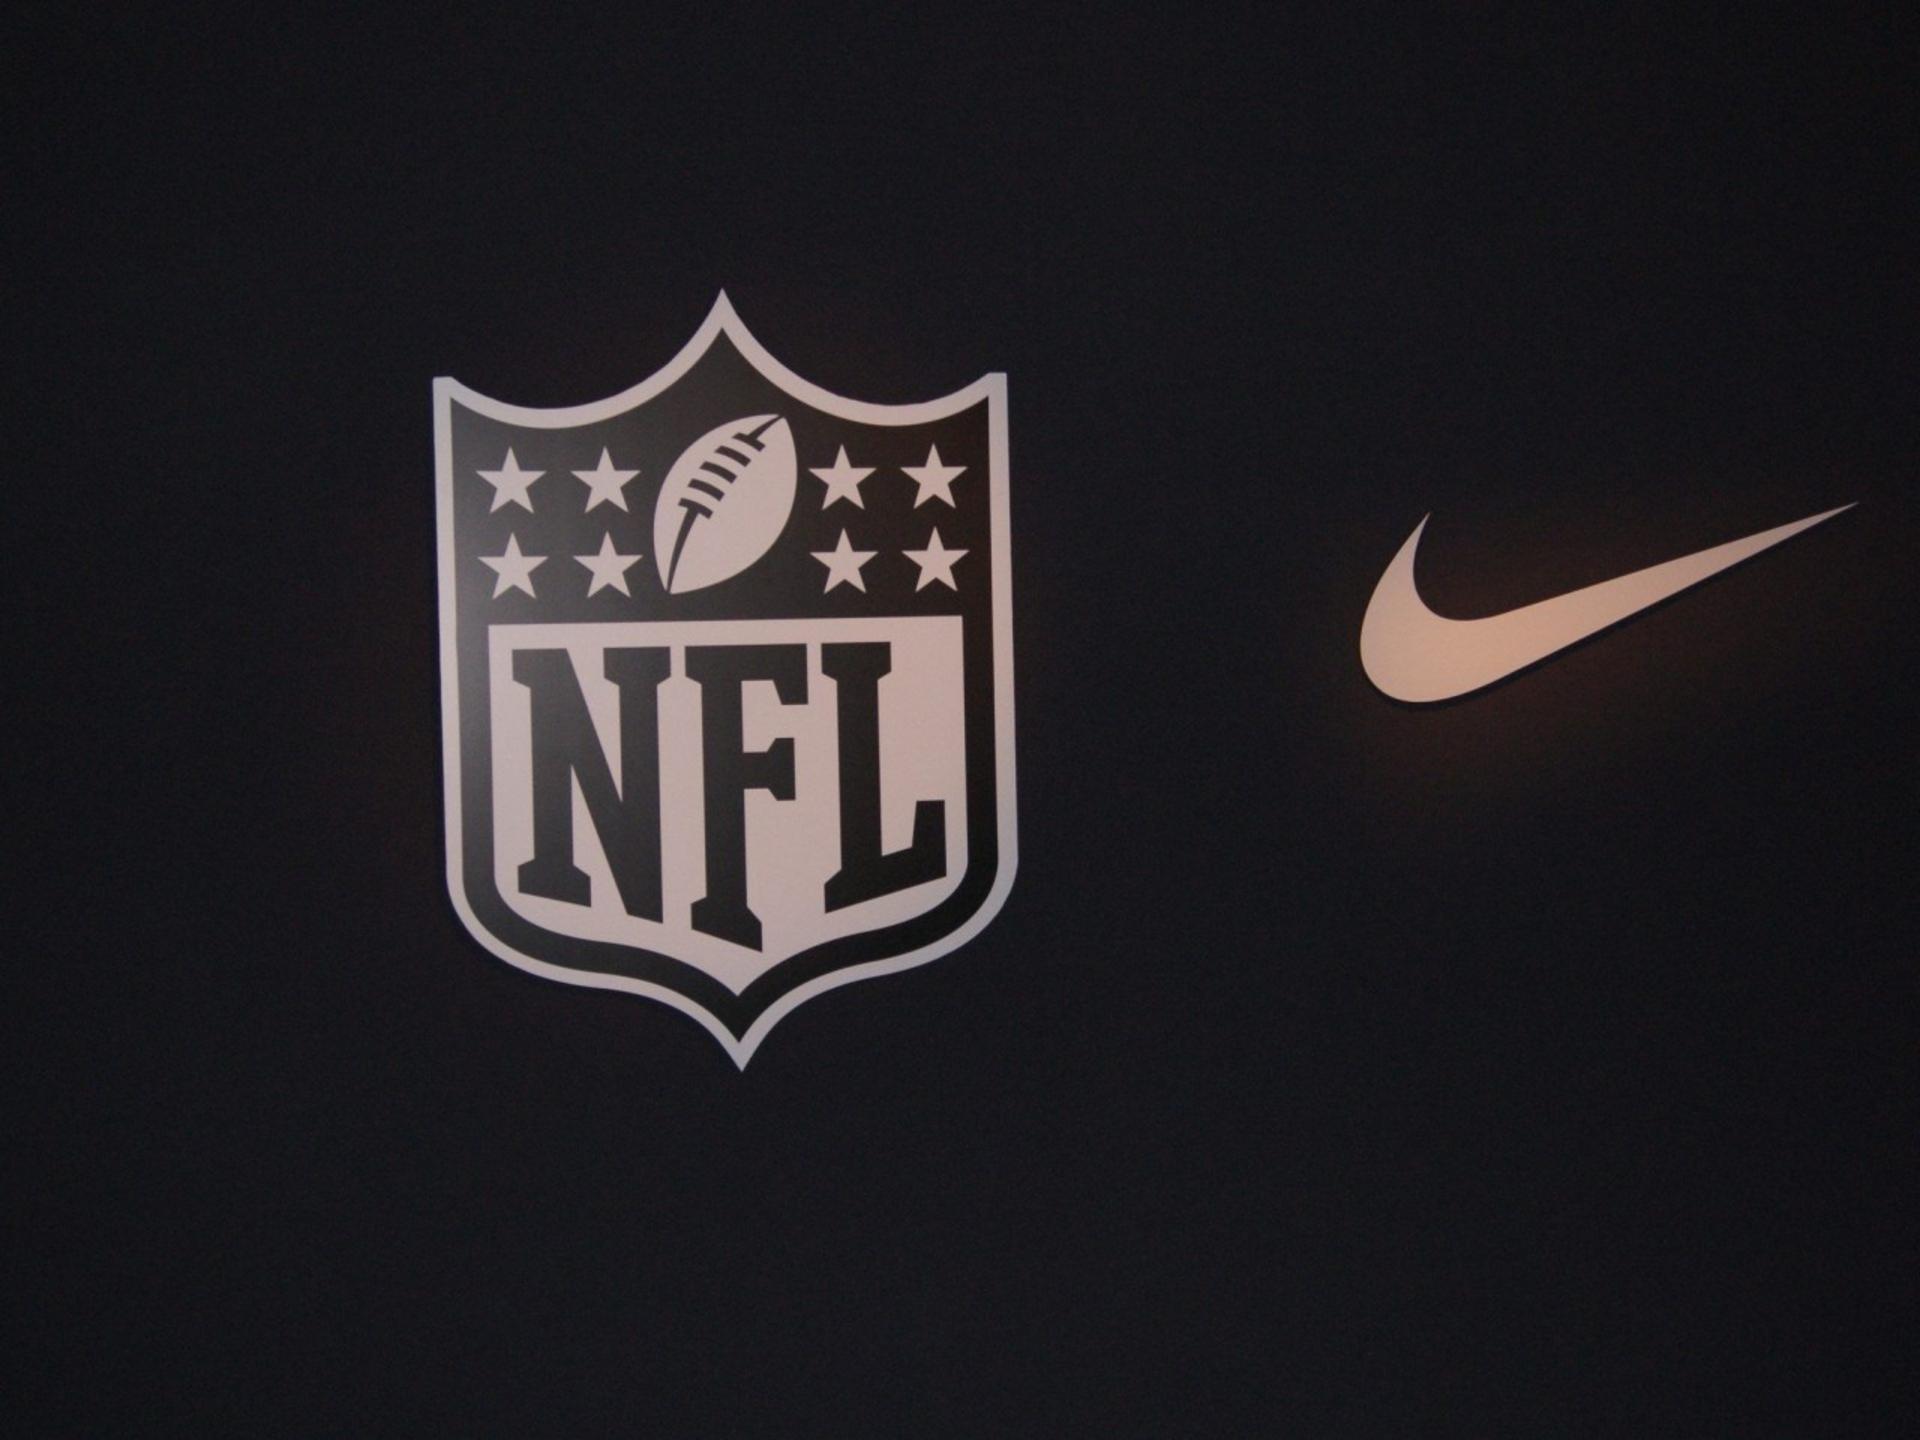 Nike Nfl Football Wallpaper wallpaper wallpaper hd background 1920x1440